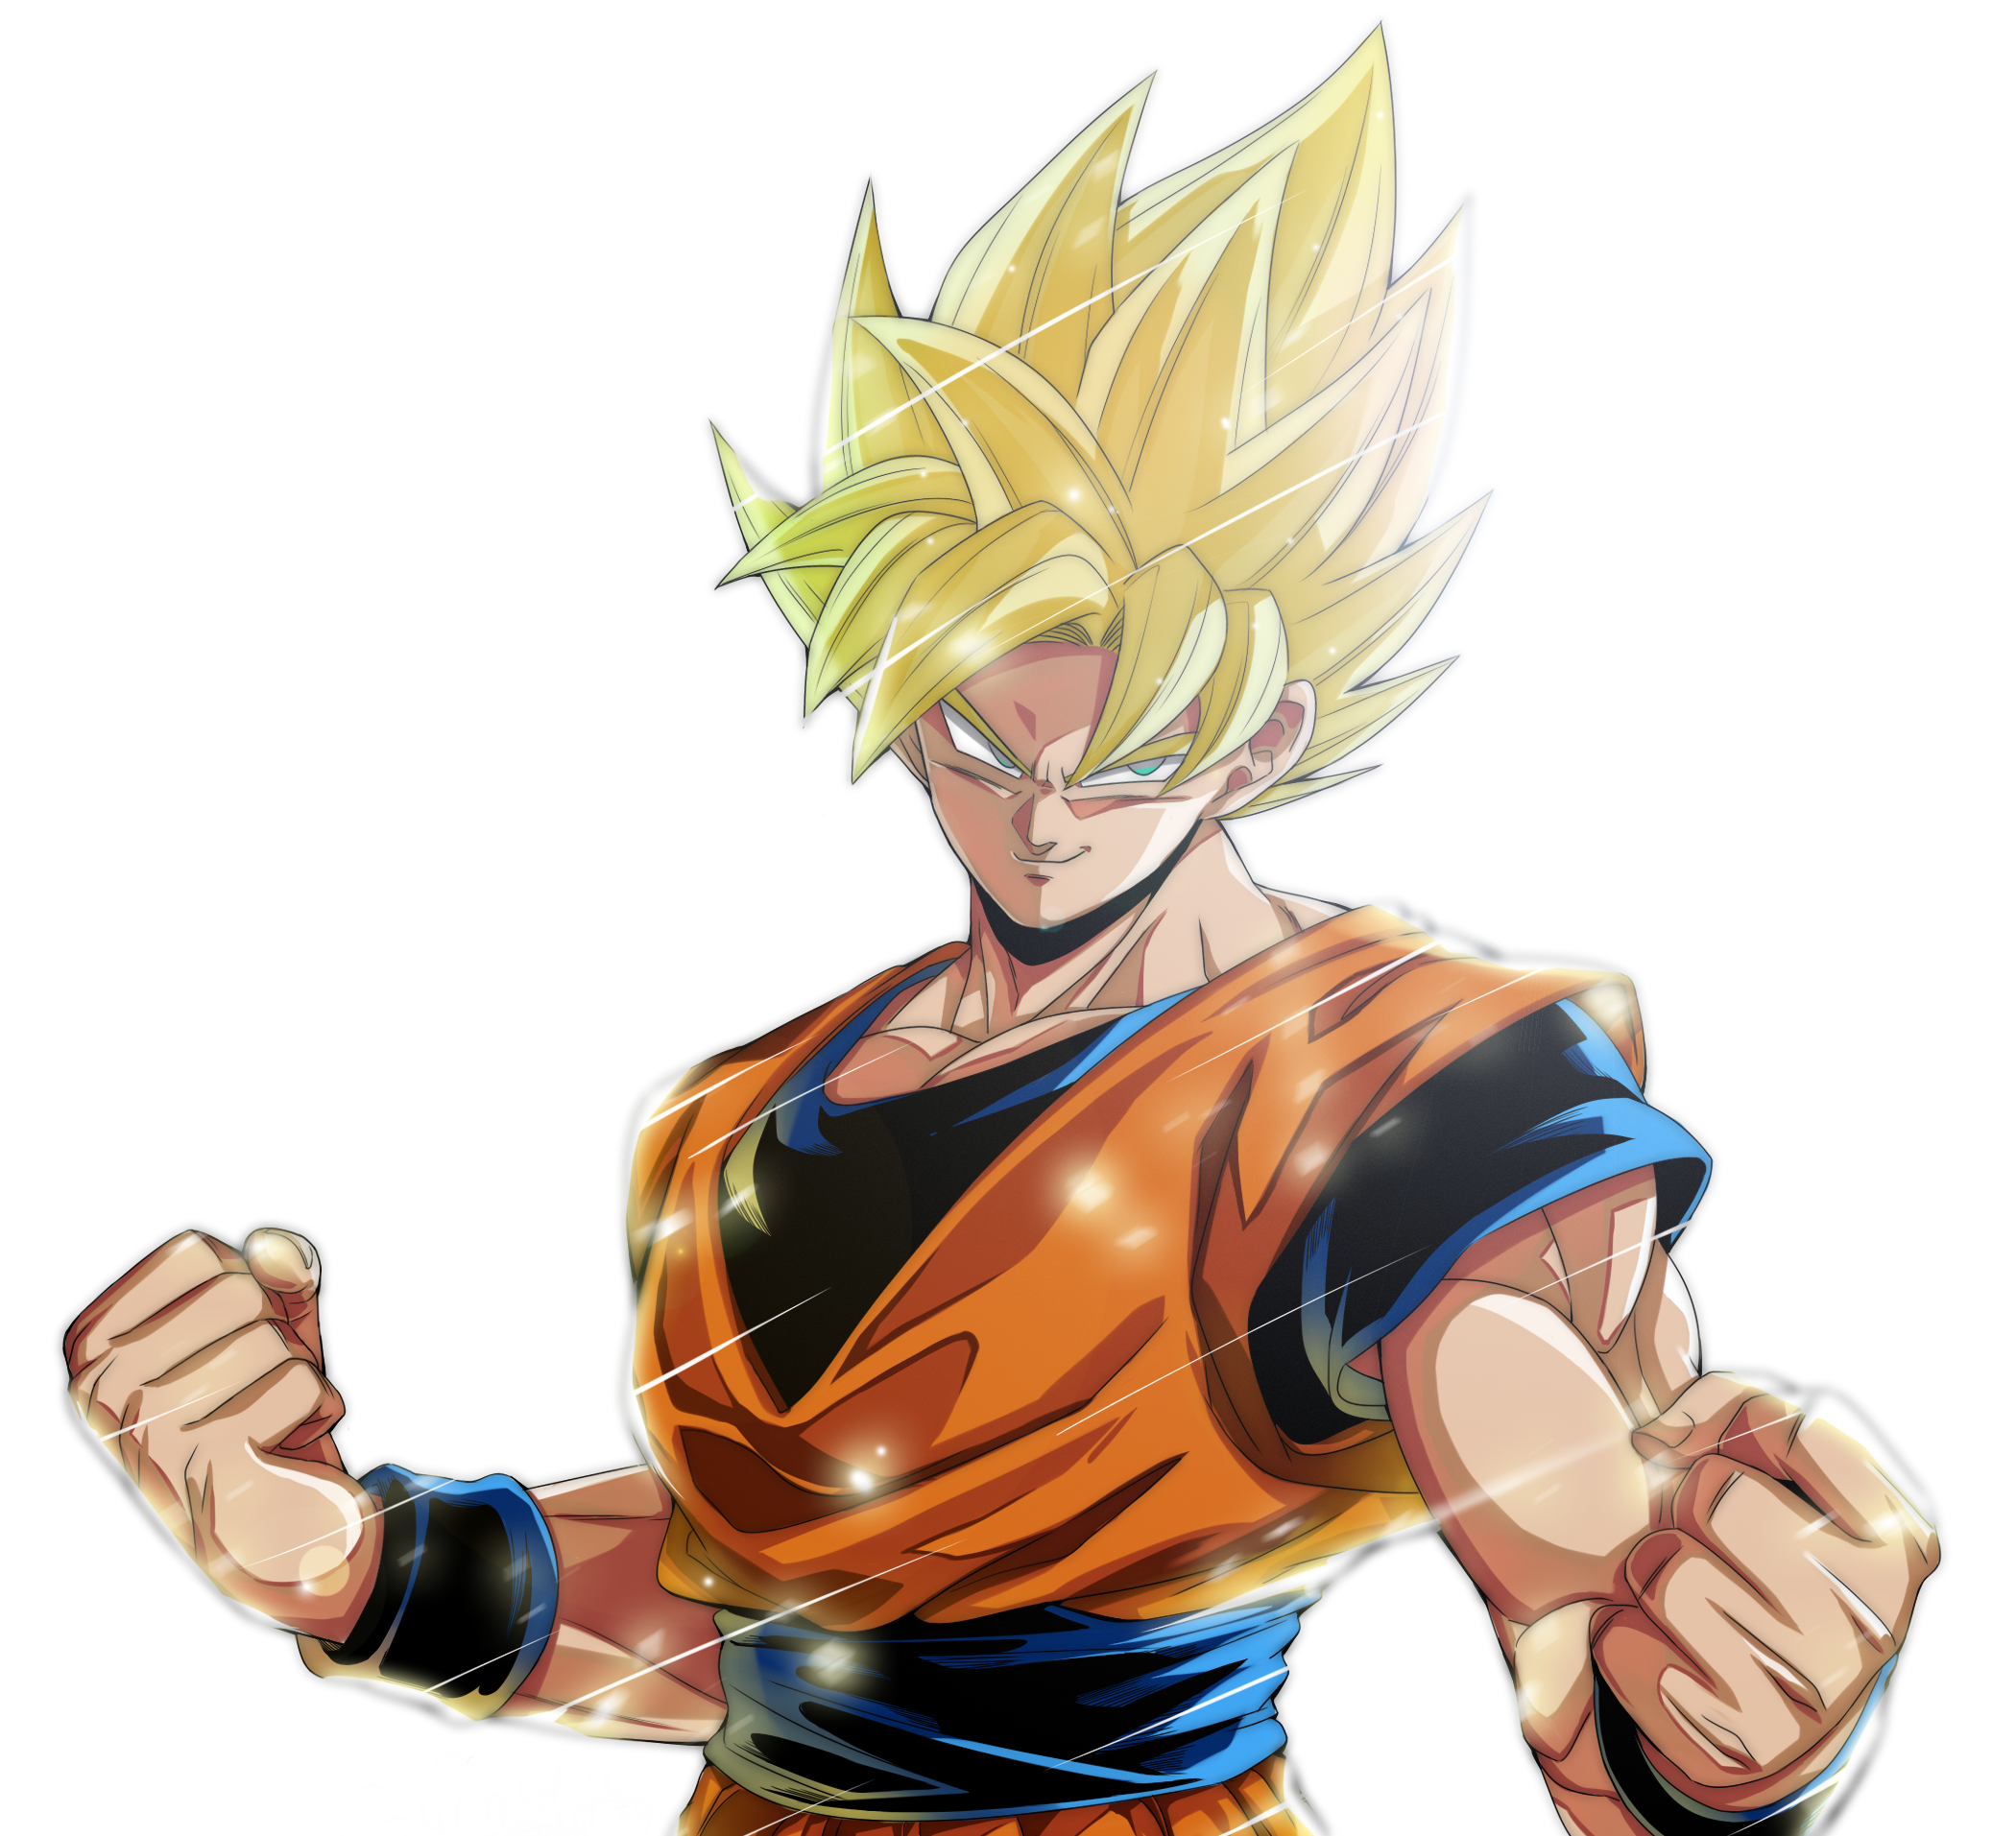 Arrowtattoo Chinesedragontattoo Dragontattoodesigns Dragontattooforwomen Targa Anime Dragon Ball Super Anime Dragon Ball Goku Dragon Ball Super Goku